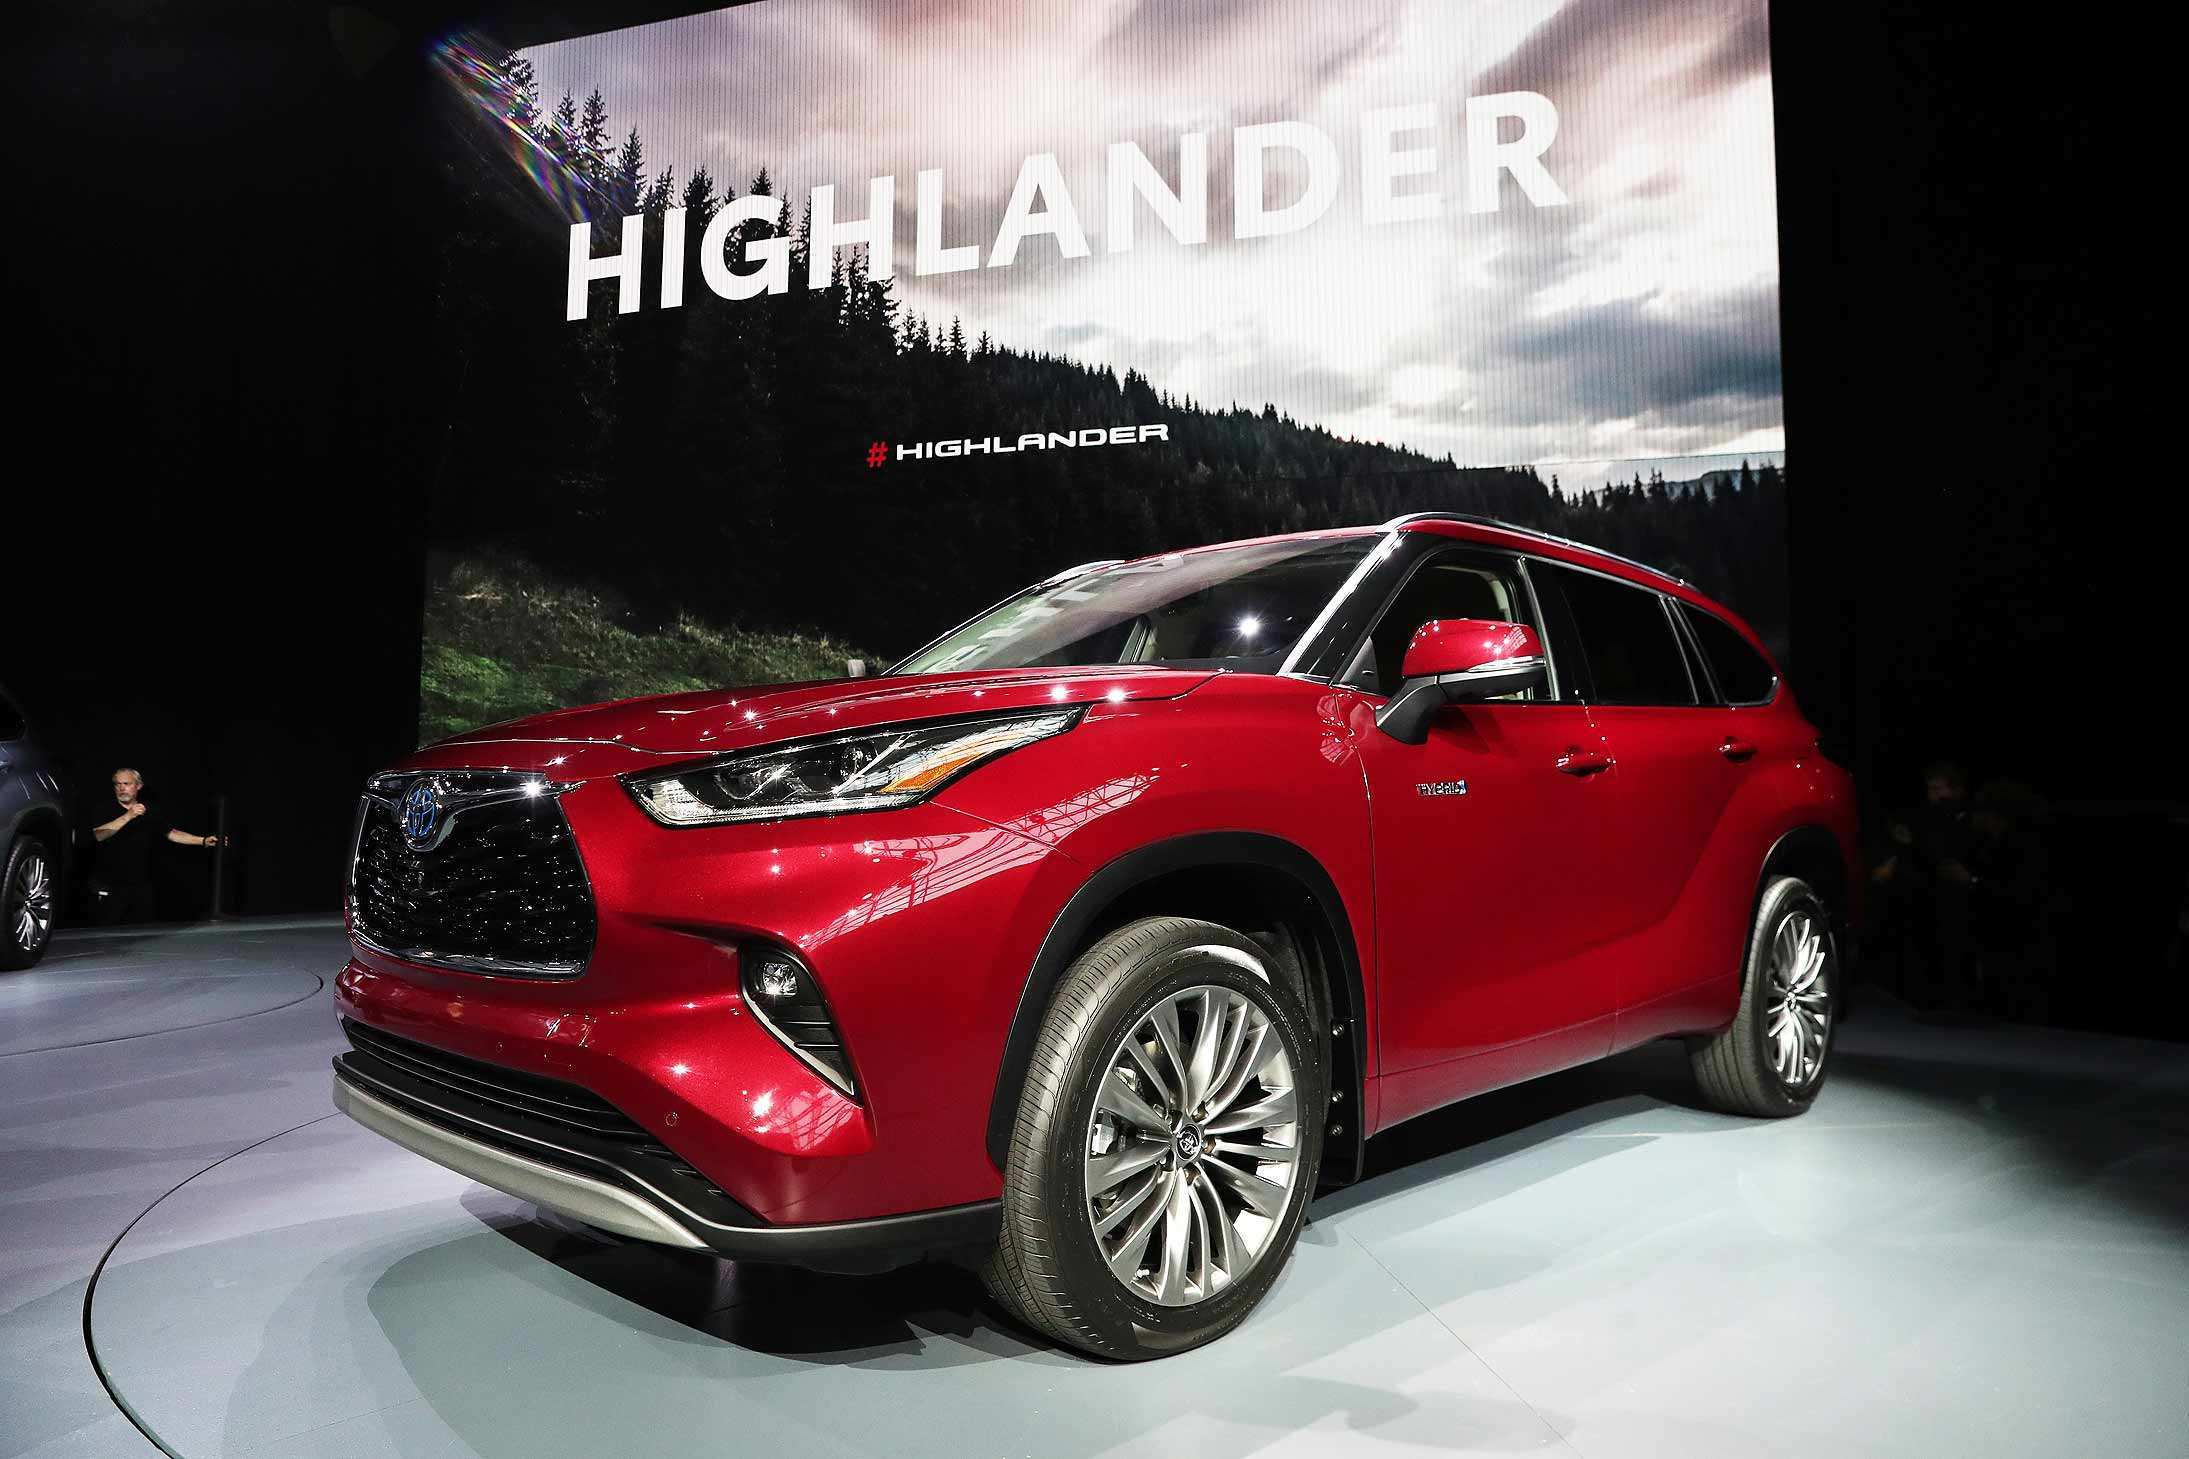 12 New Mitsubishi Hybrid 2020 Overview by Mitsubishi Hybrid 2020